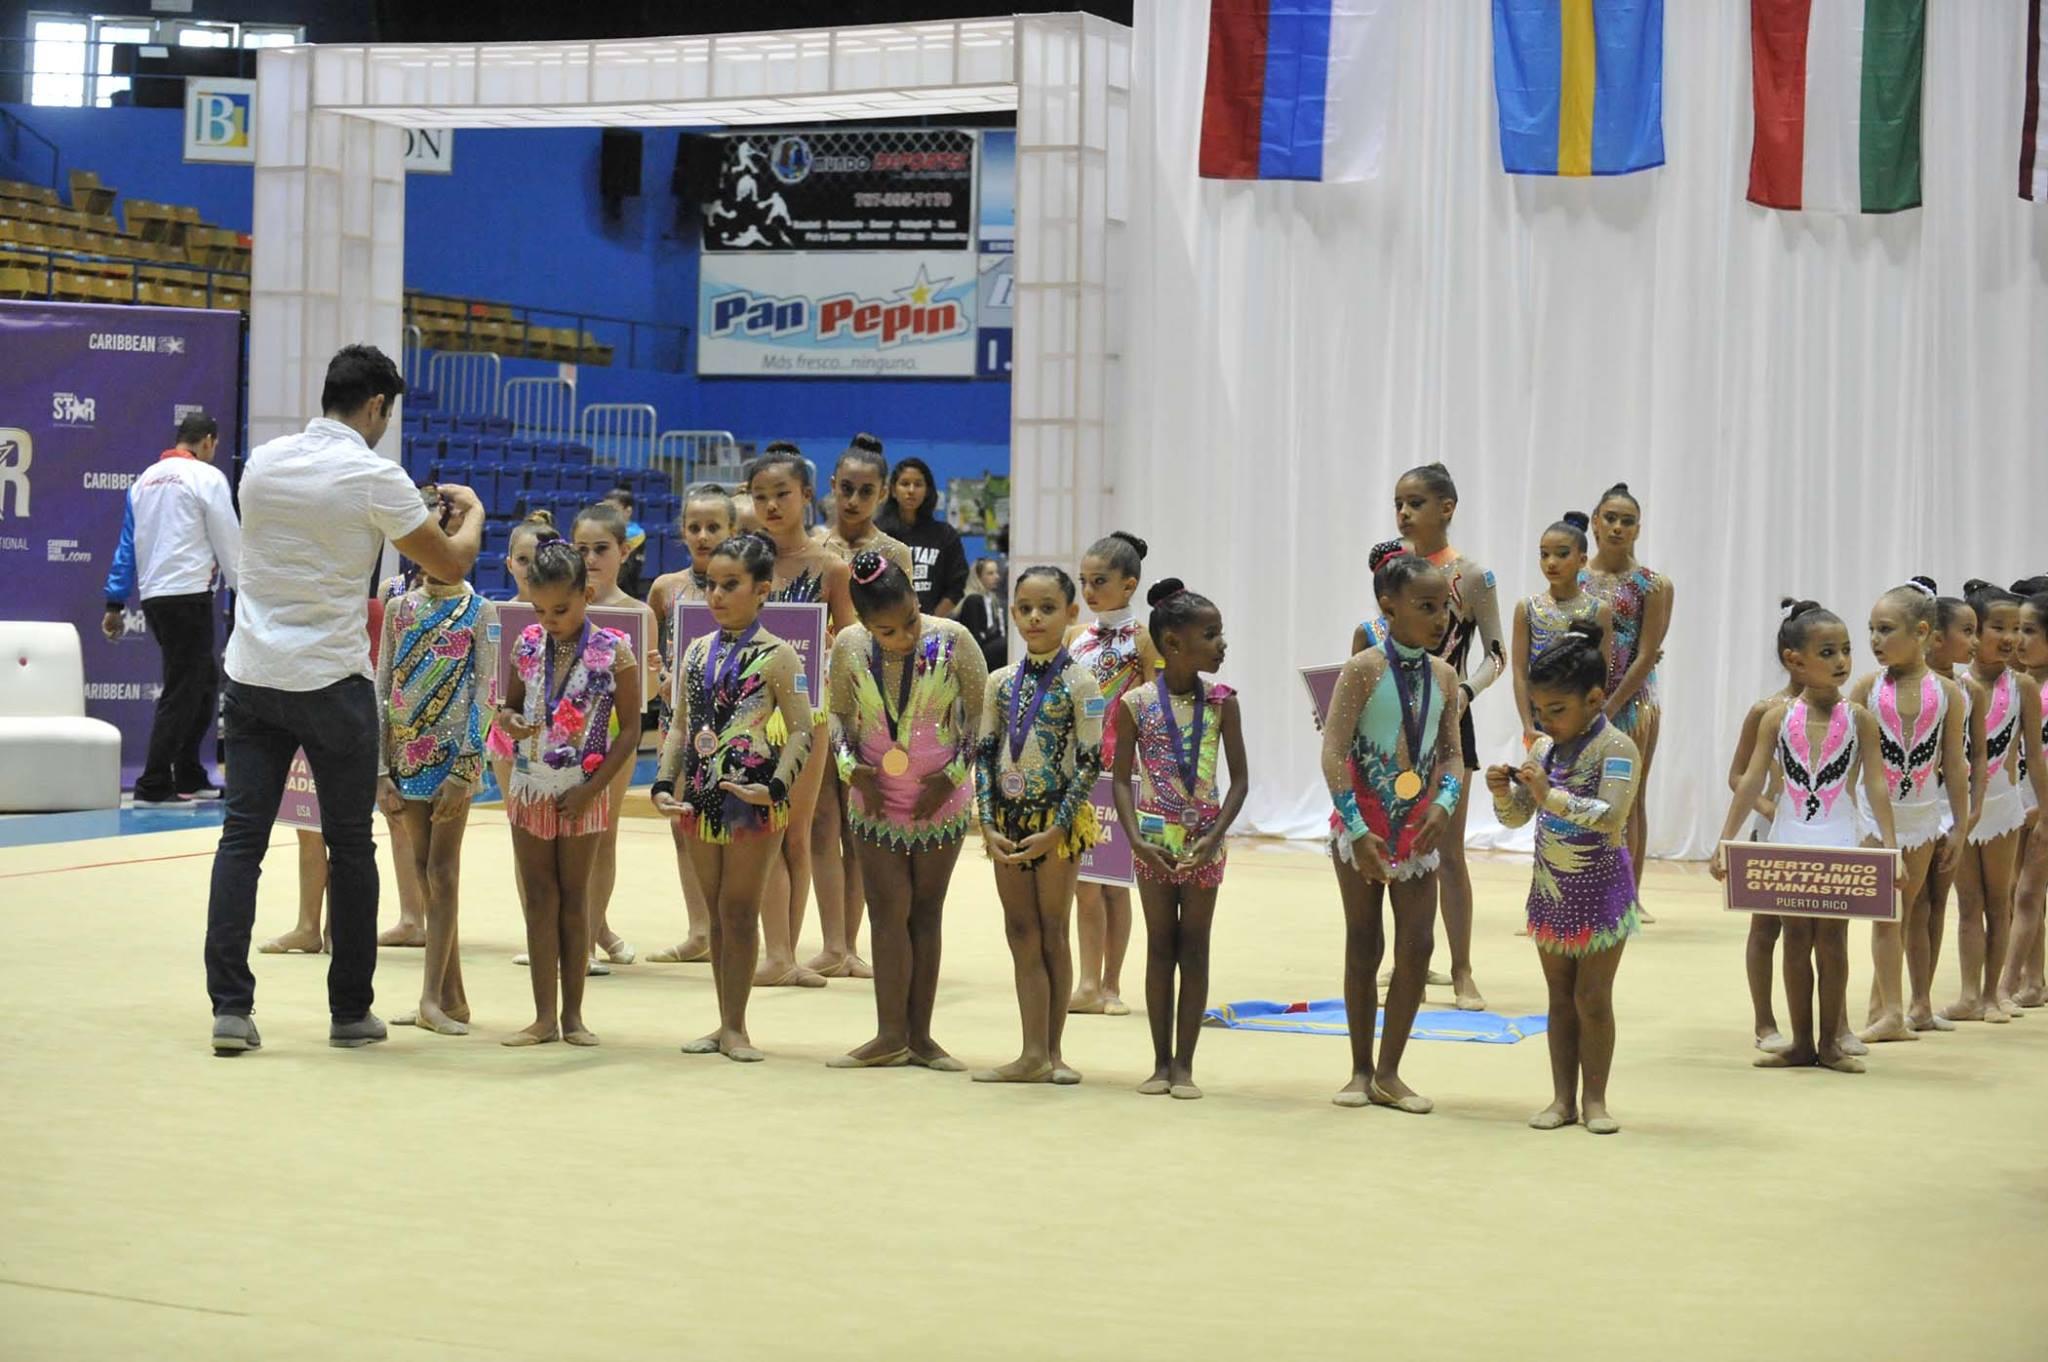 Niña participantes del Caribbean Star Rhytmic Gymnastics Invitational